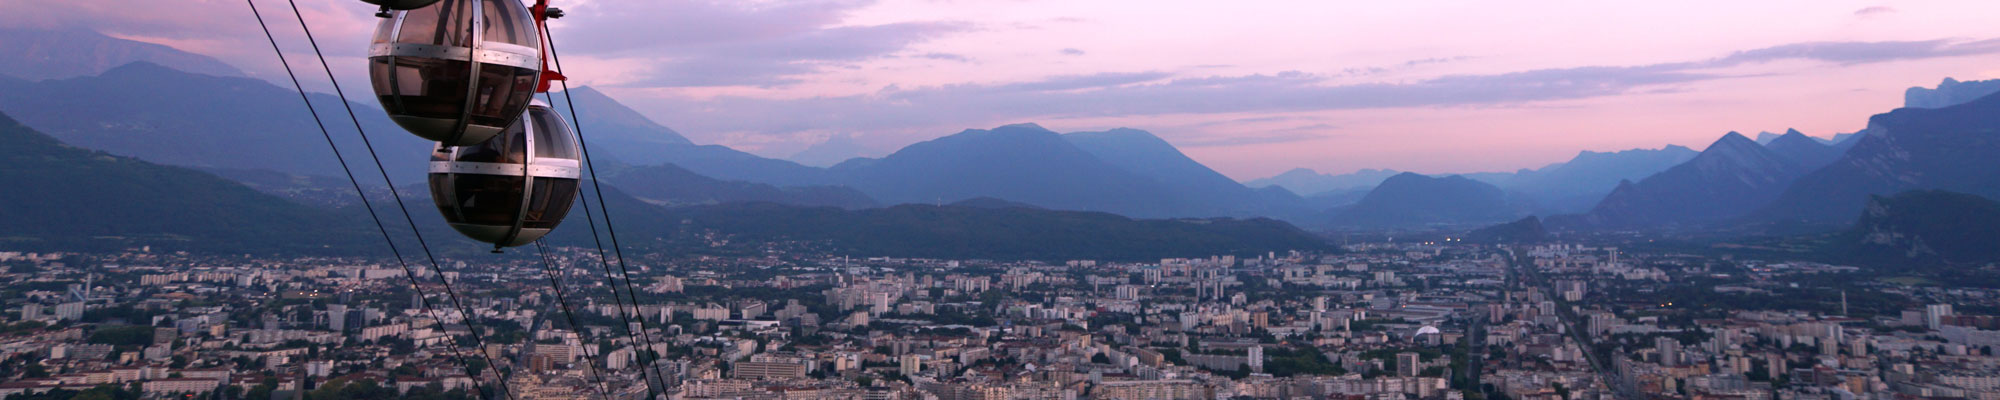 MBA à Grenoble / Diplôme Bac+5 en alternance